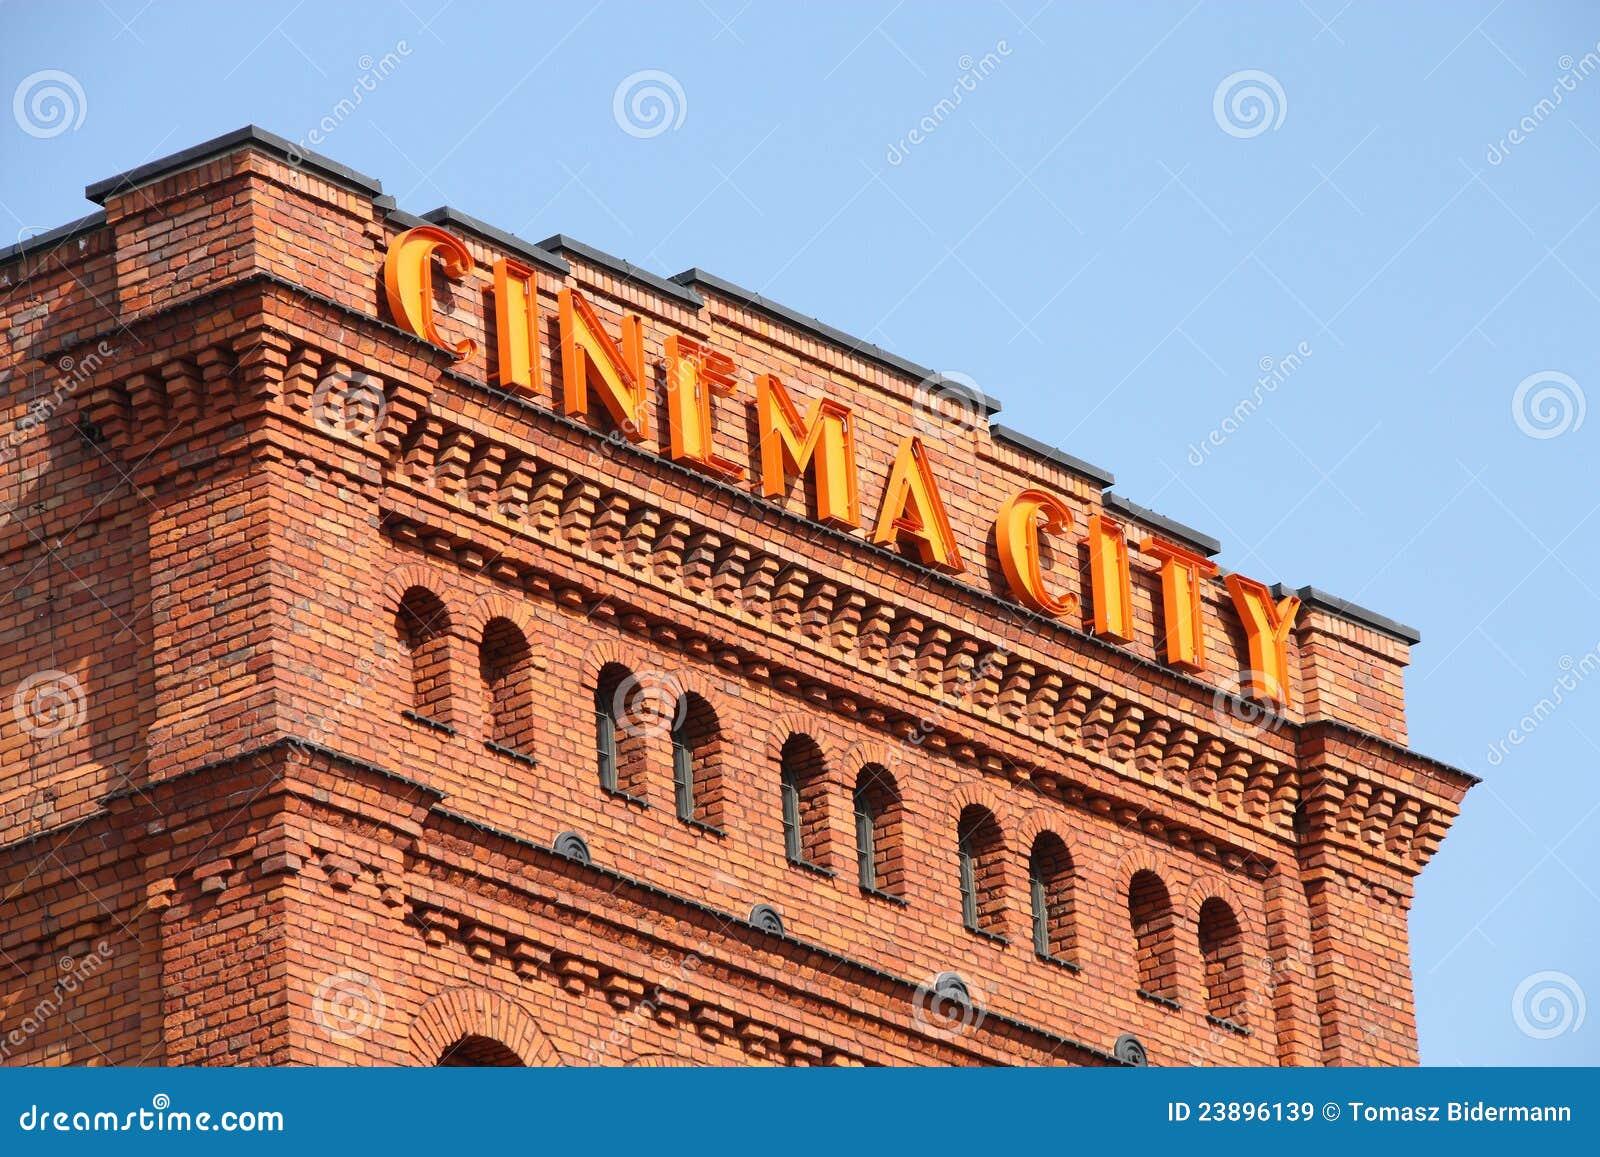 cinema city rishon lezion business plan